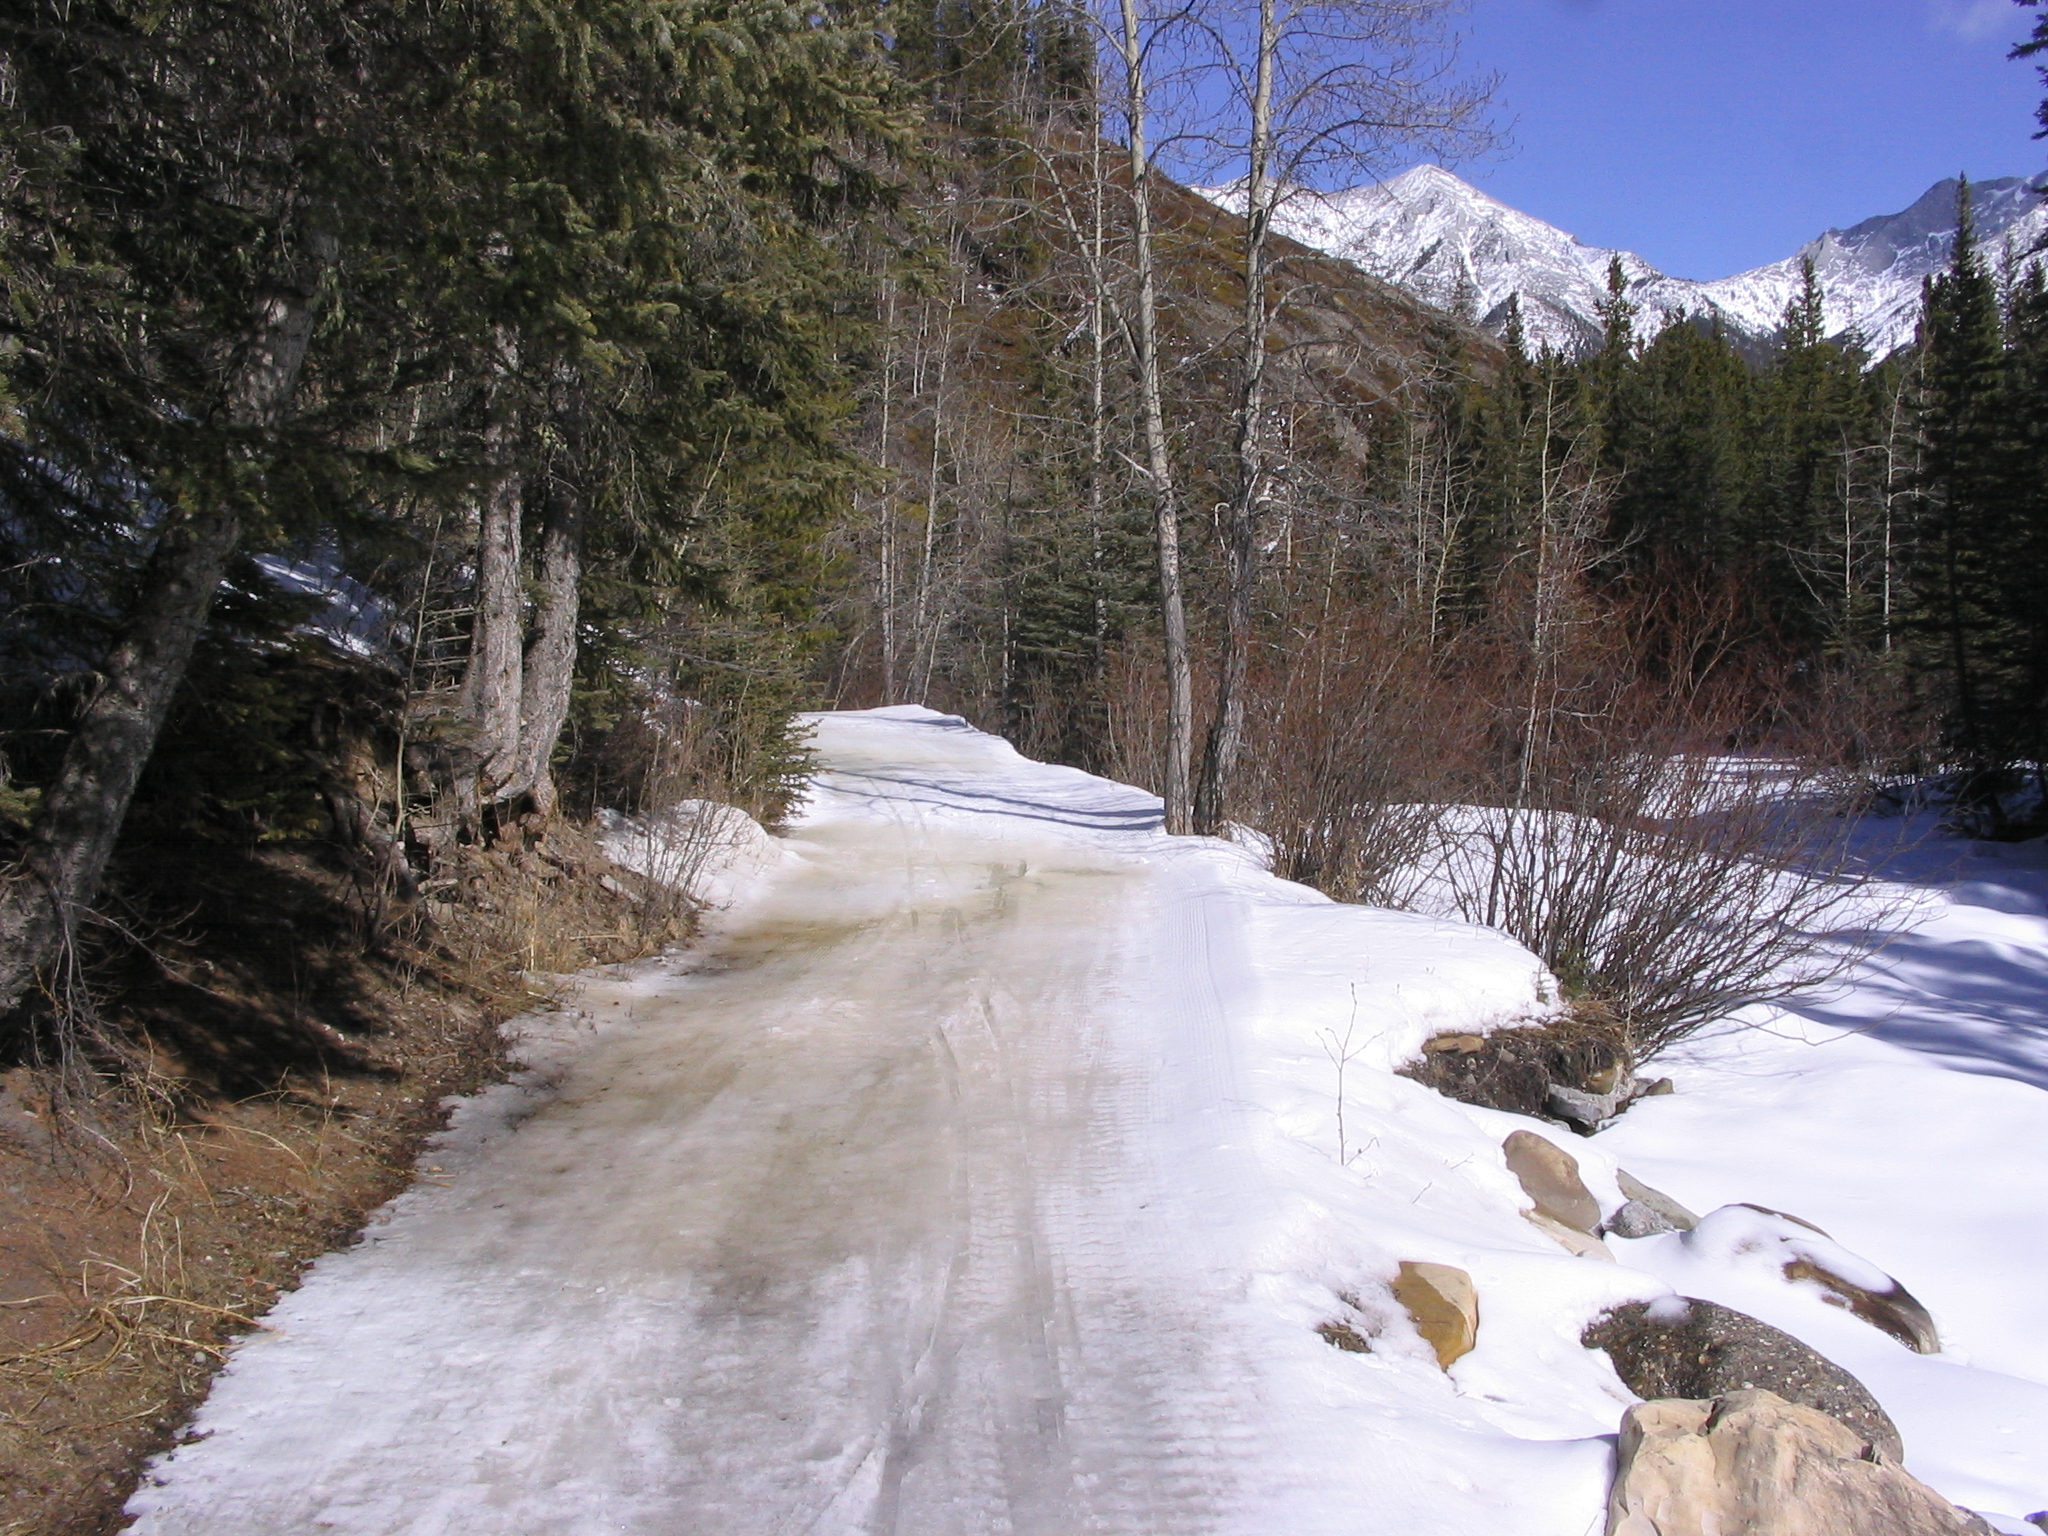 Ribbon Creek's melting snow Mar 19, 2009